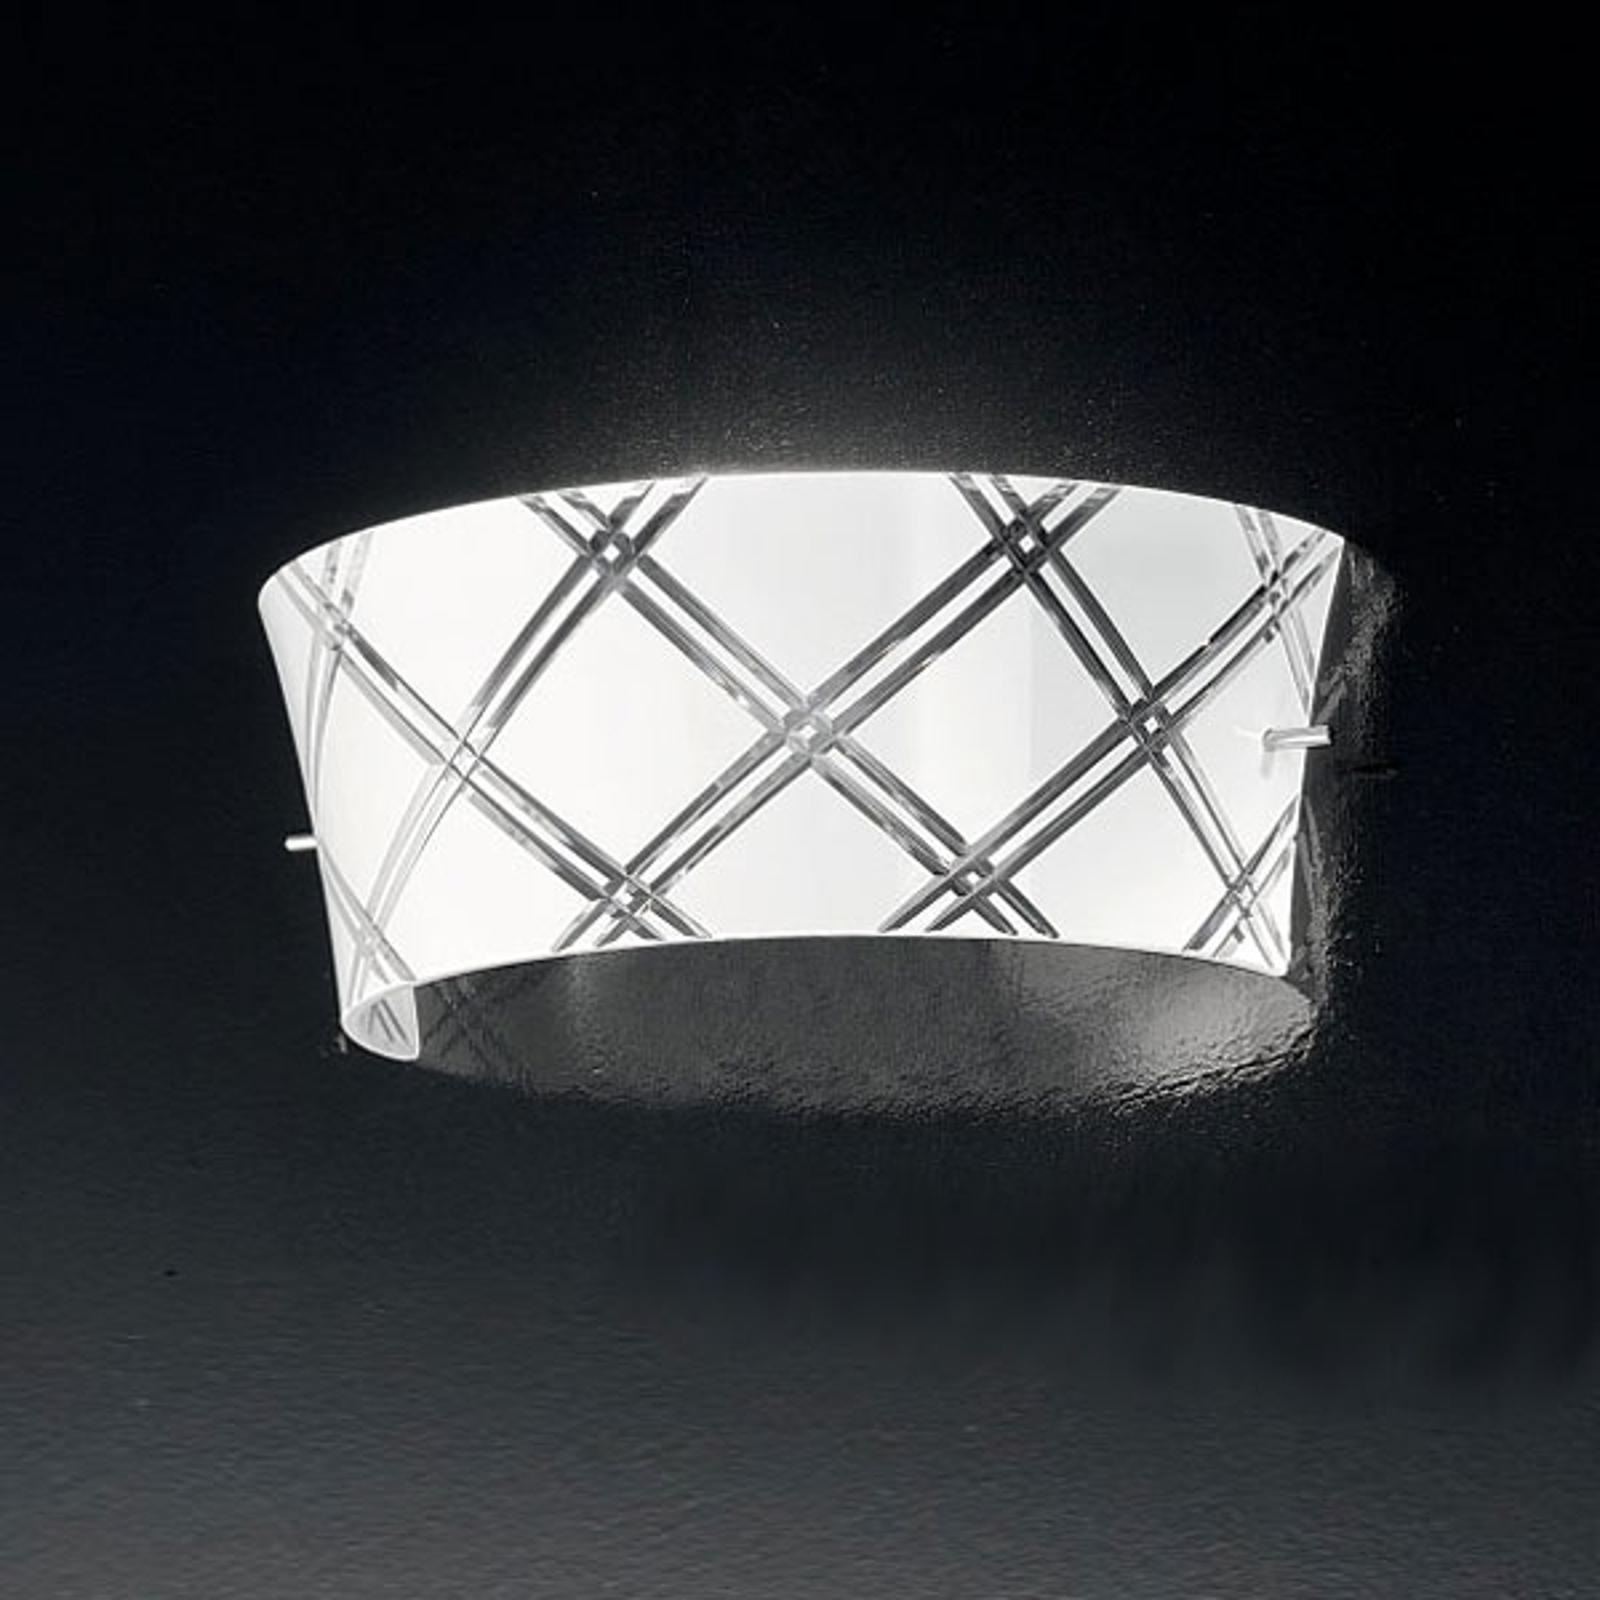 Elegant vegglampe CORALLO, 1 lys, hvit